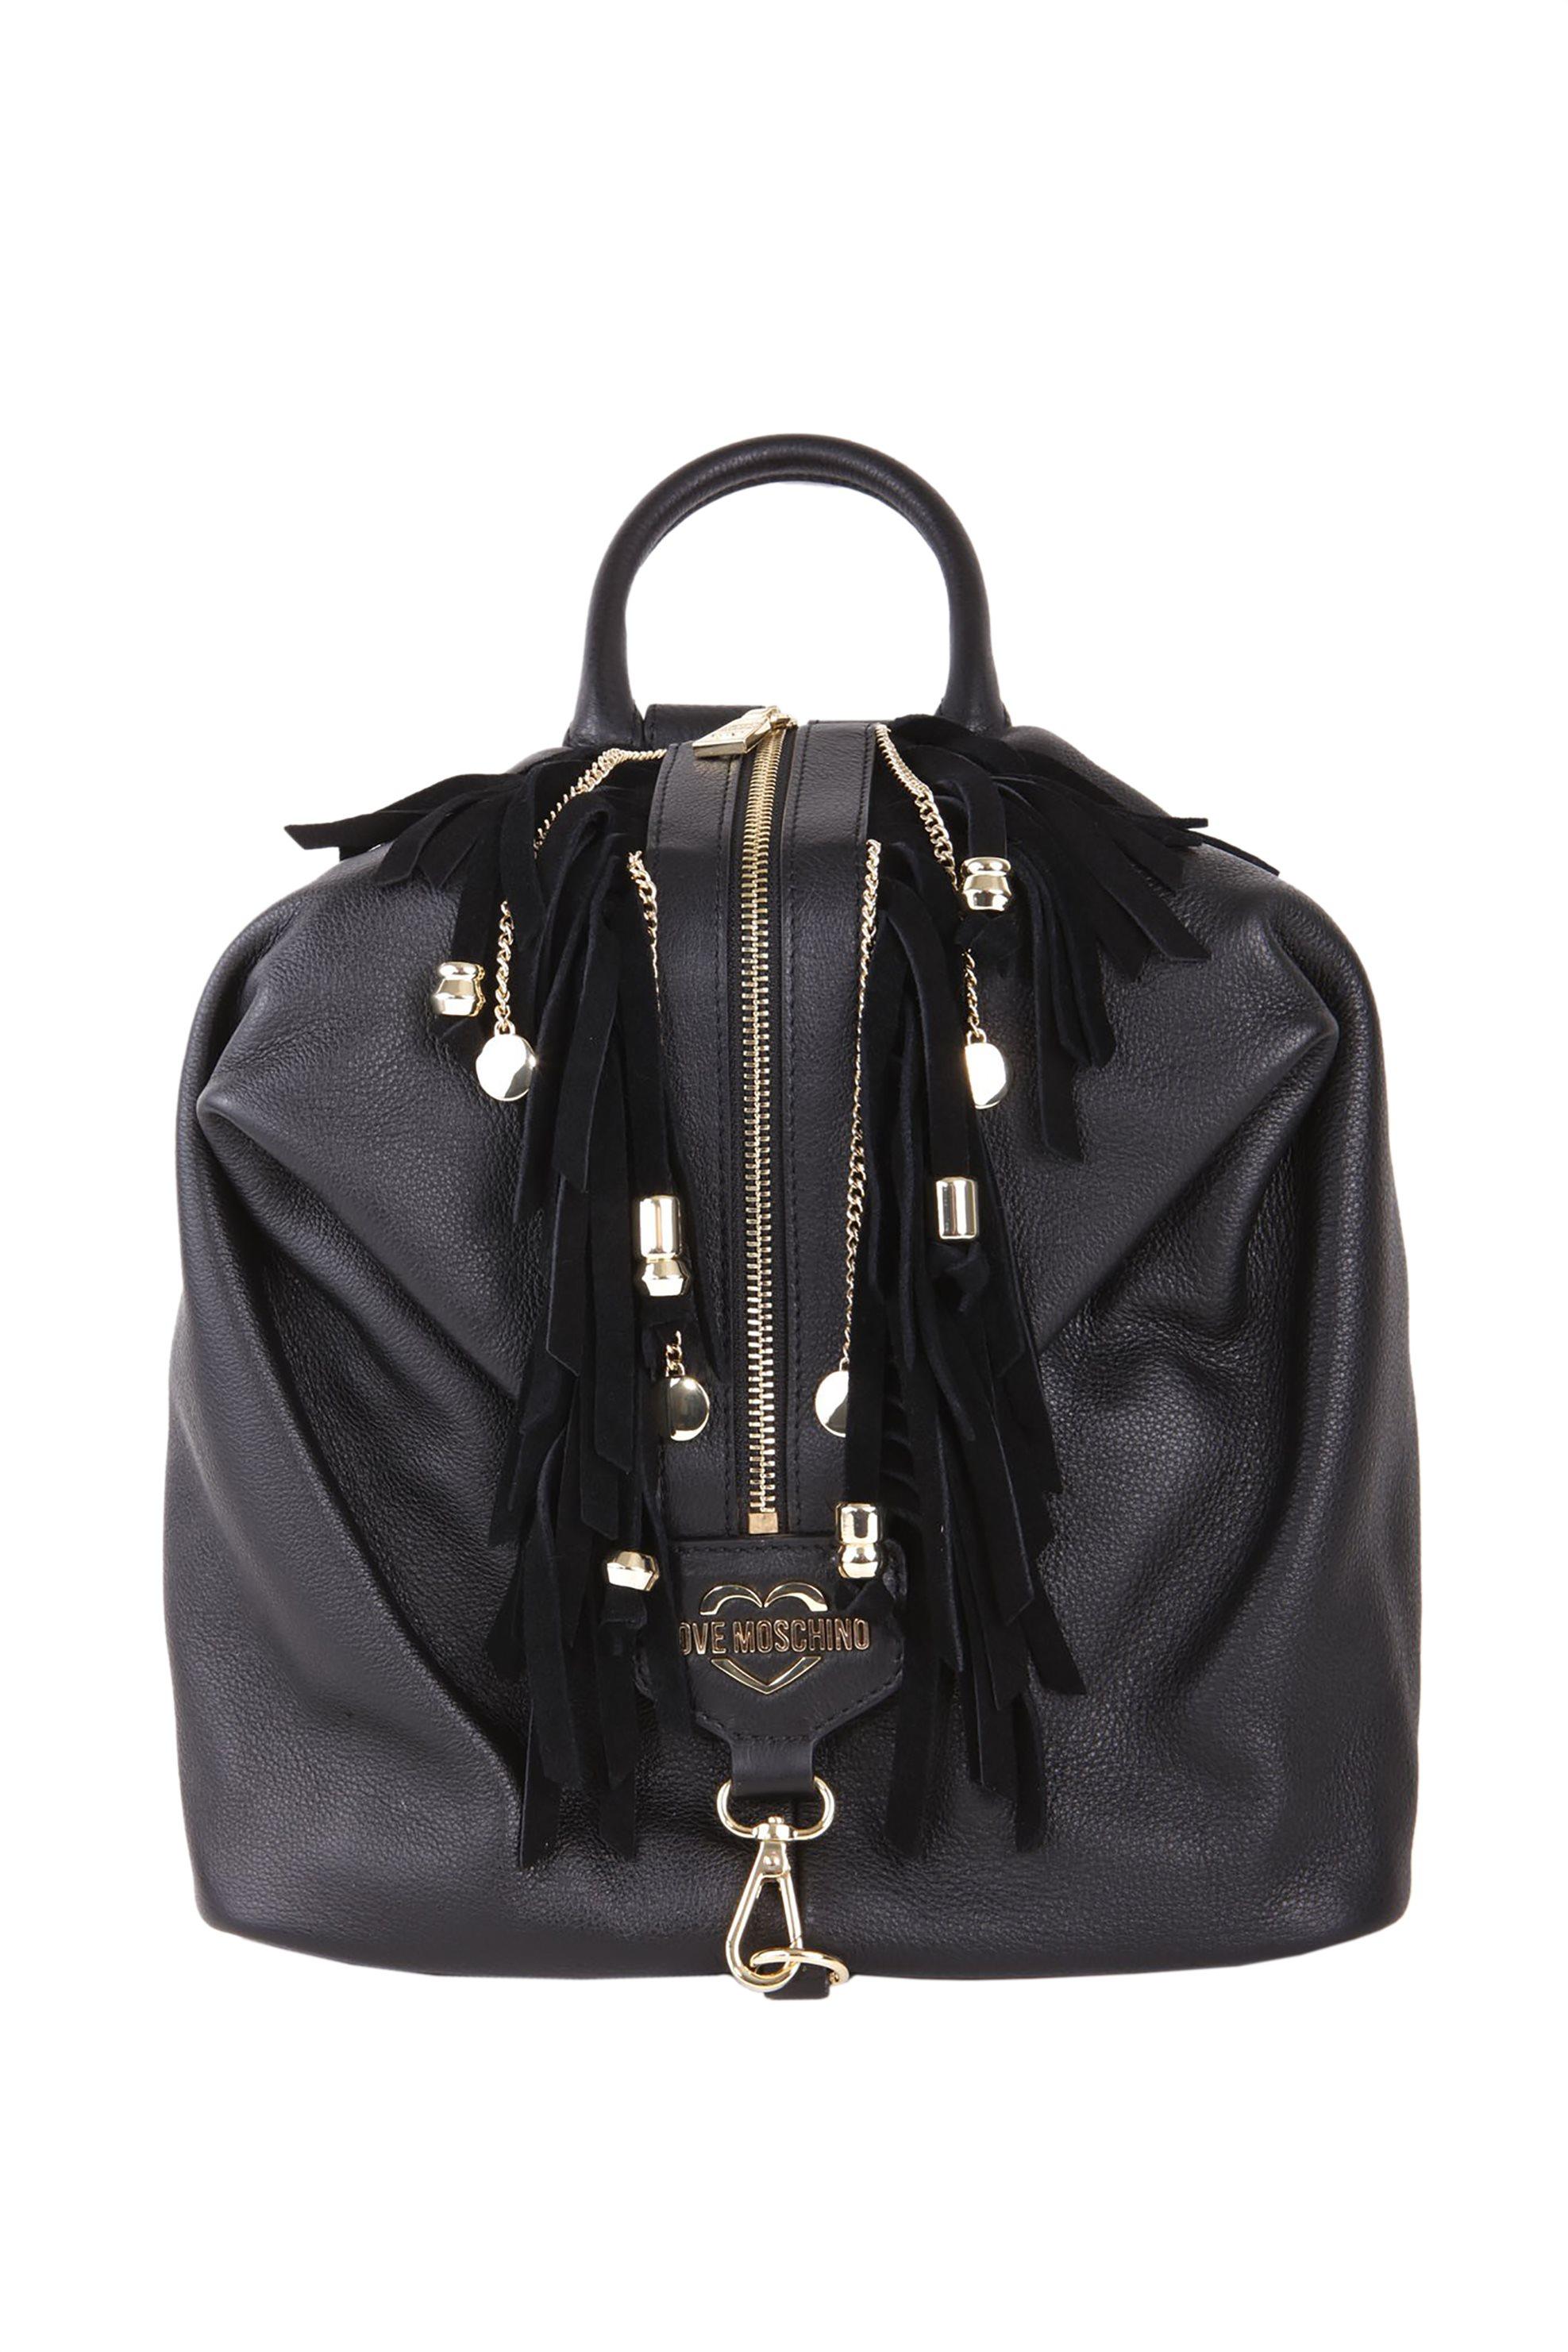 5c4fdcffef Notos Love Moschino γυναικείο backpack με κρόσσια - JC4136PP17LT0 - Μαύρο